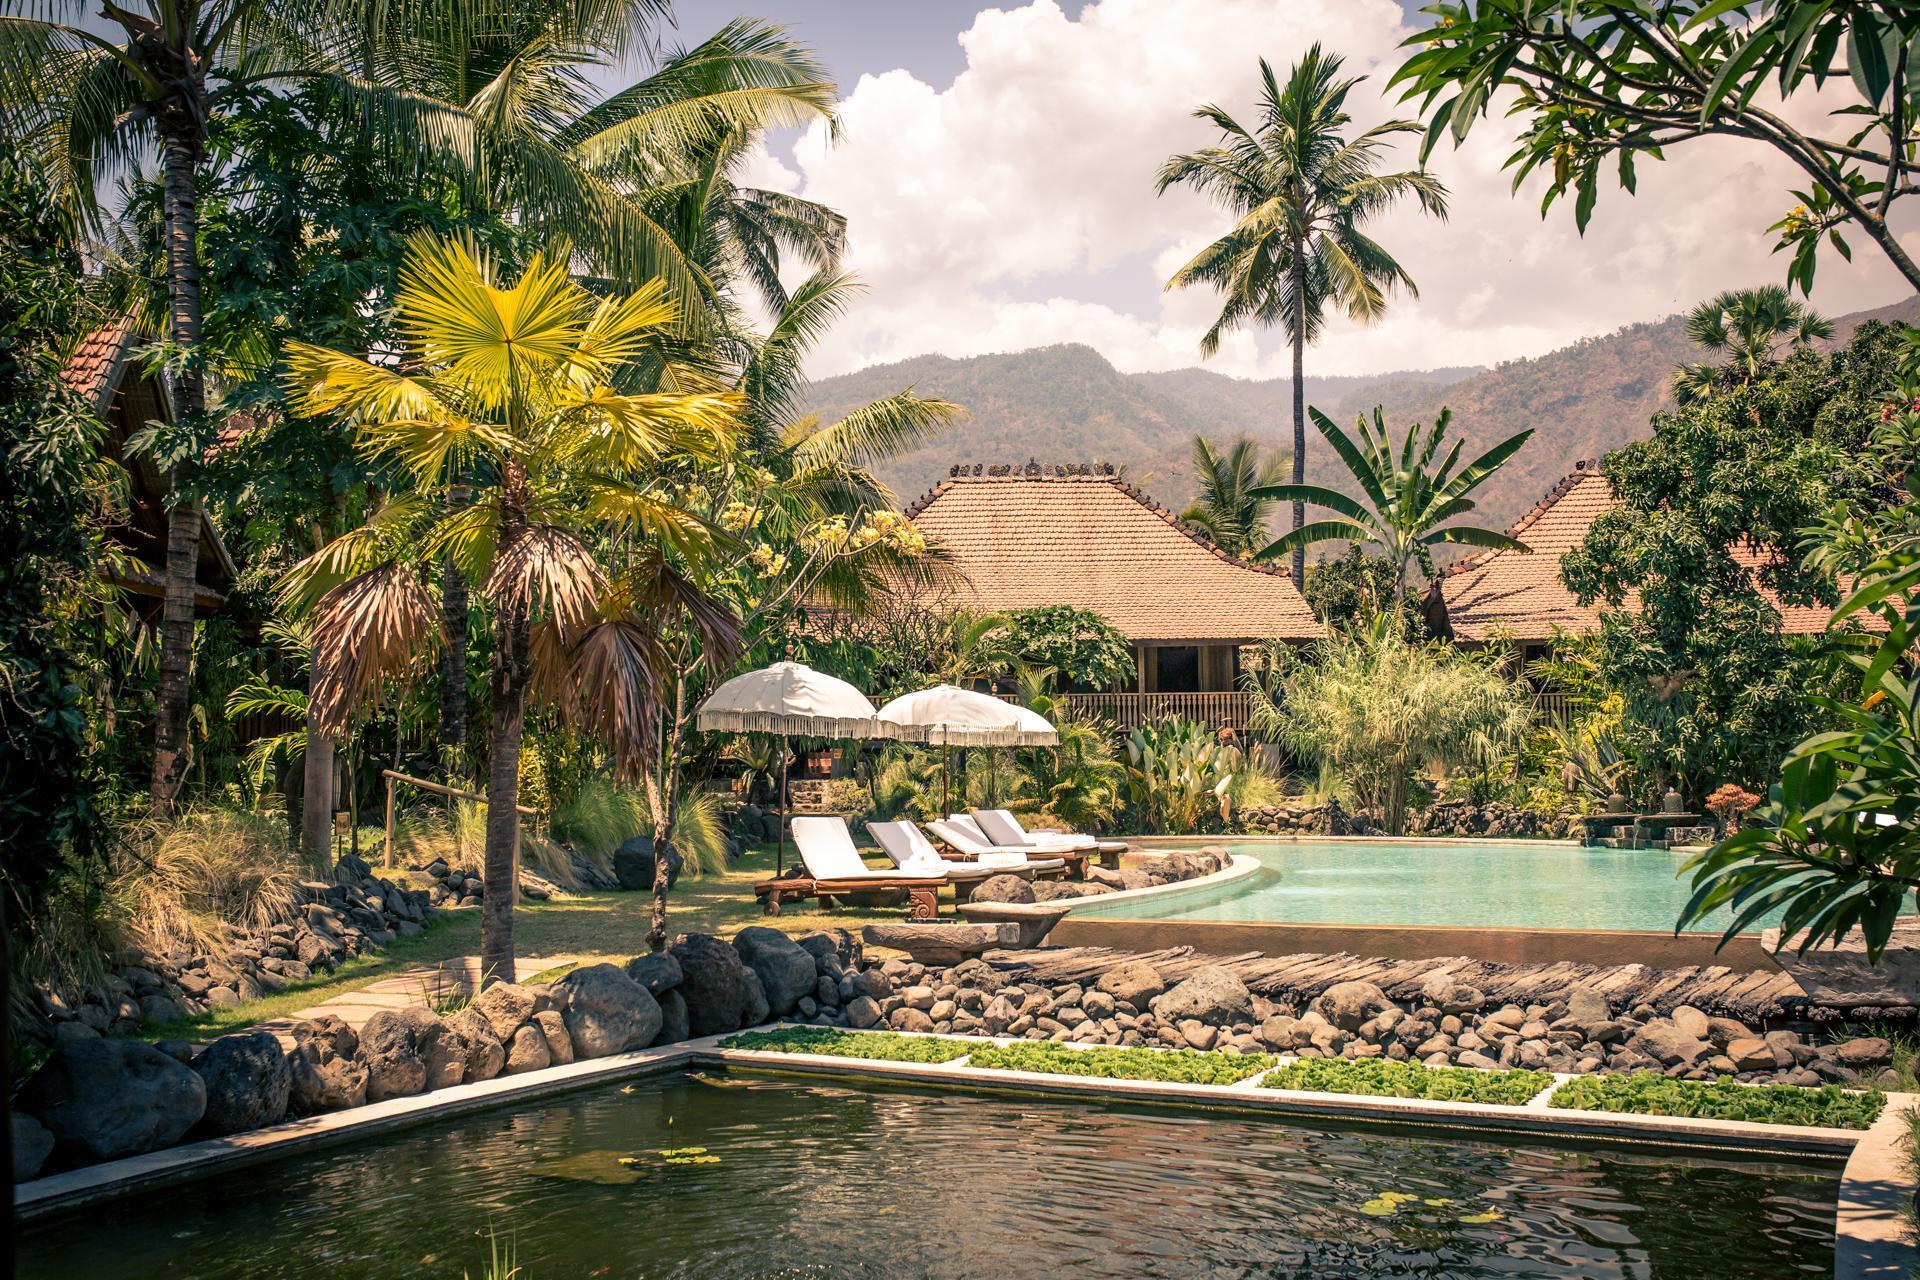 Desa Saya Eco Luxury Resort & Spa, Buleleng